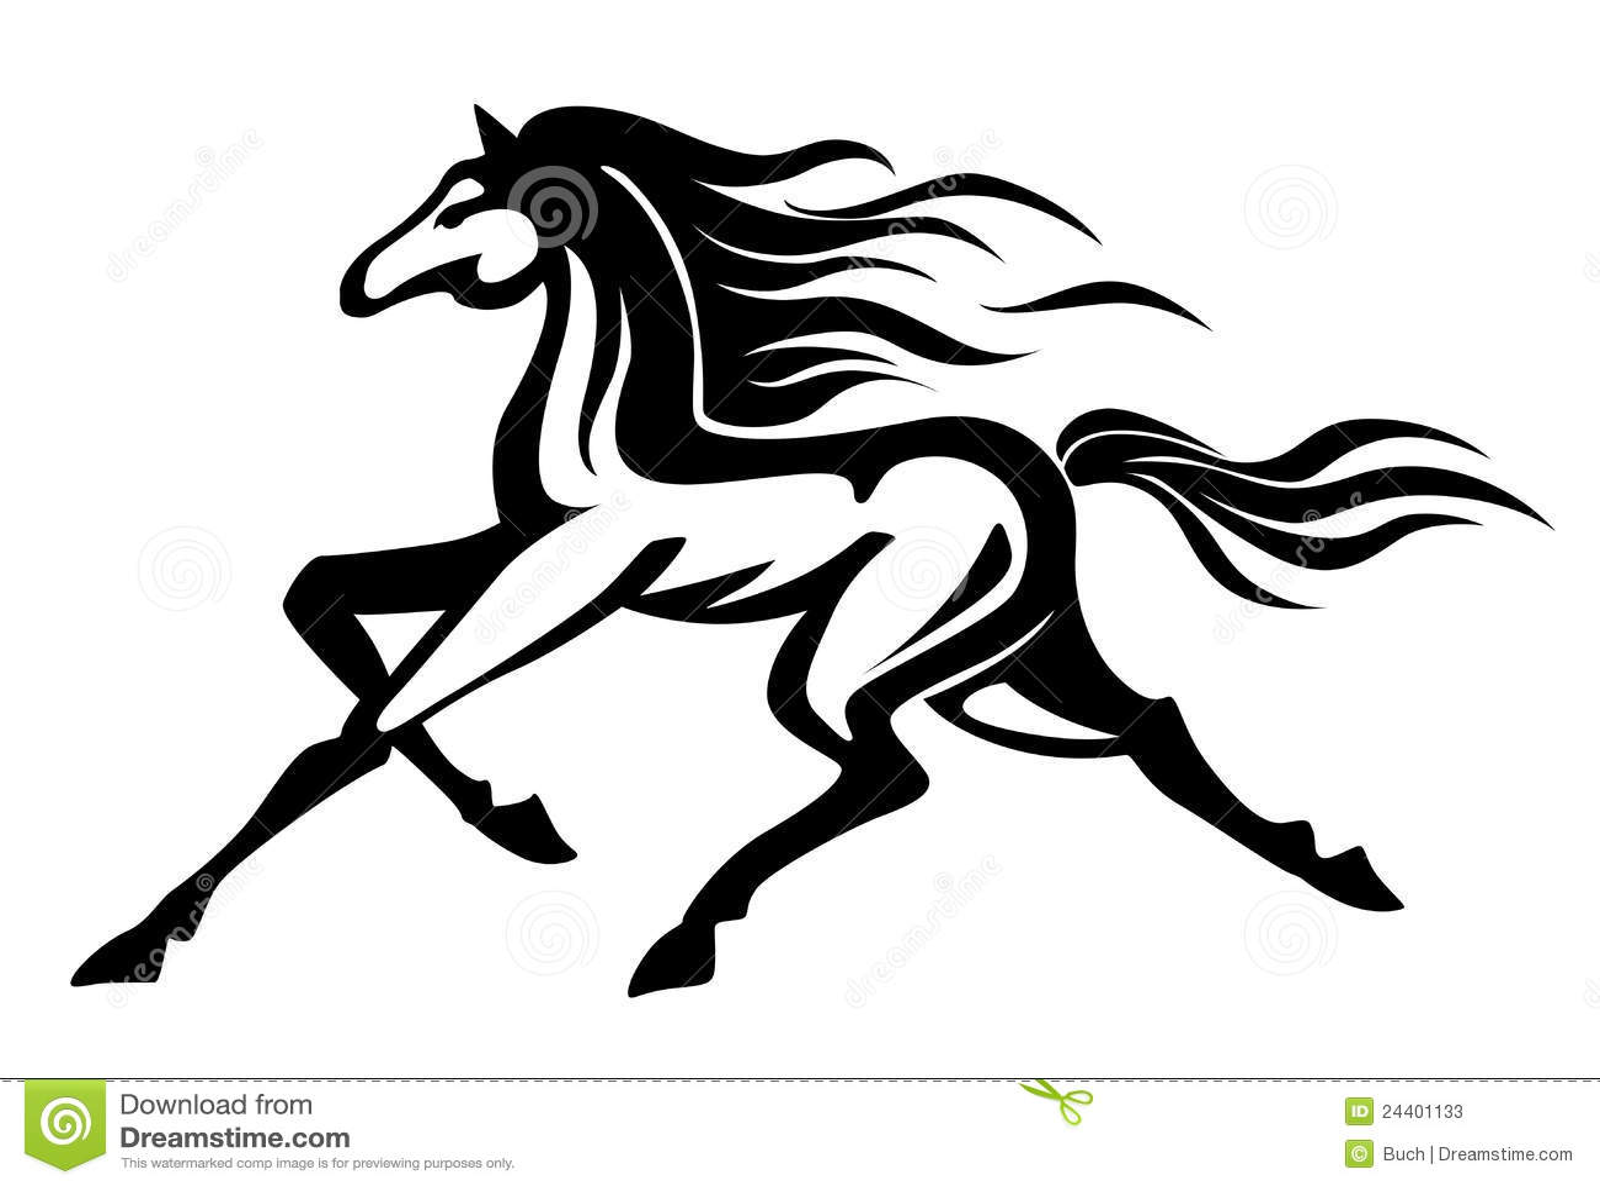 Running Horse Stock Photos - Image: 24401133 - photo#18